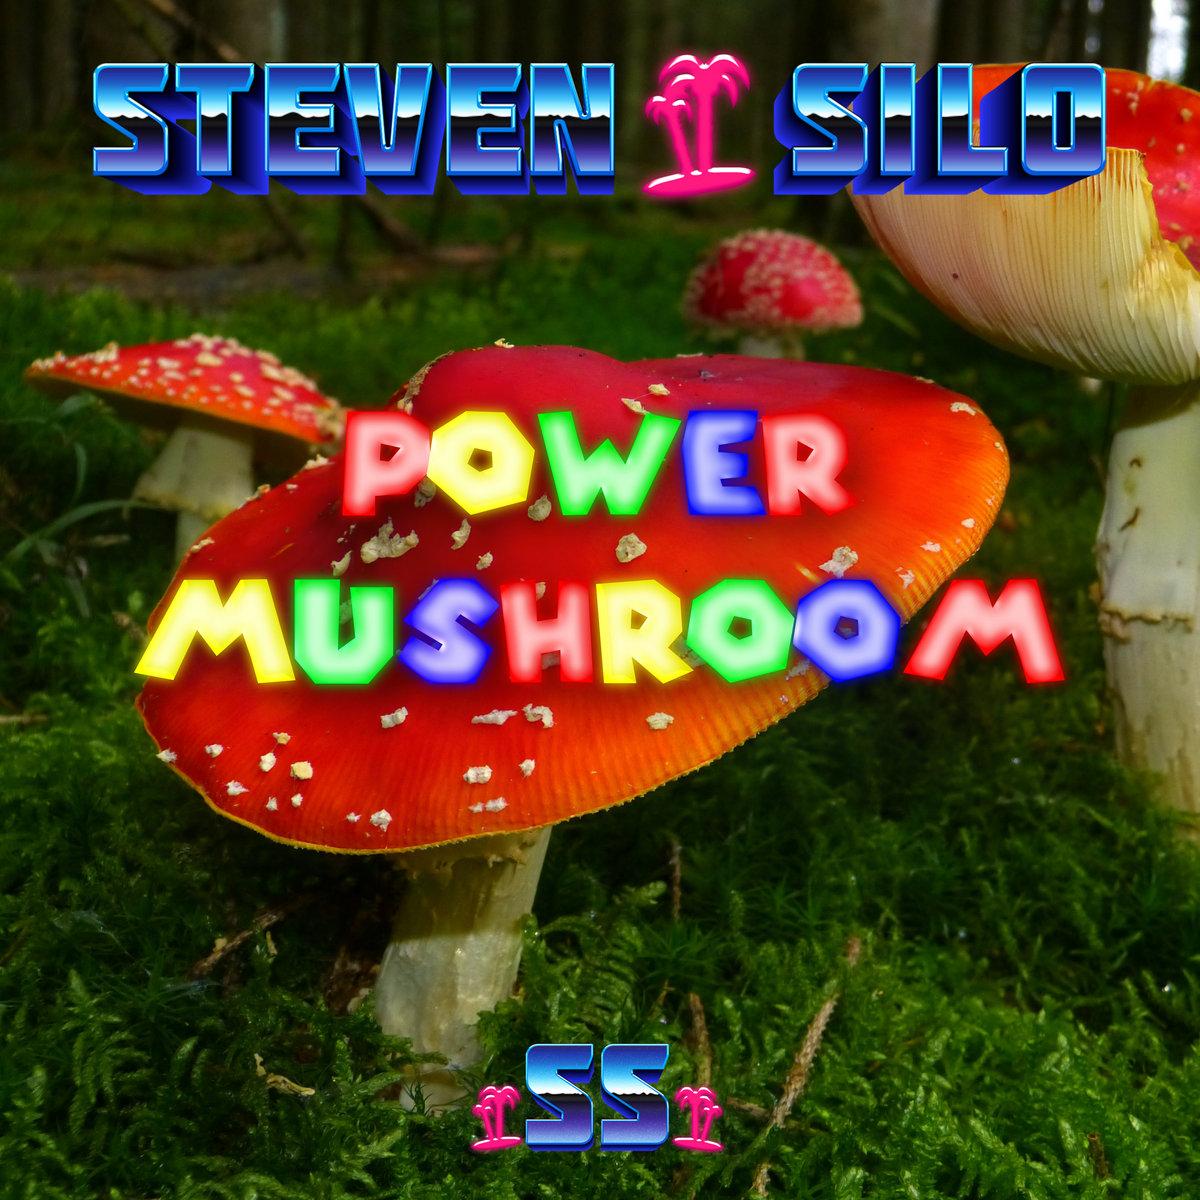 Power Mushroom by Steven Silo